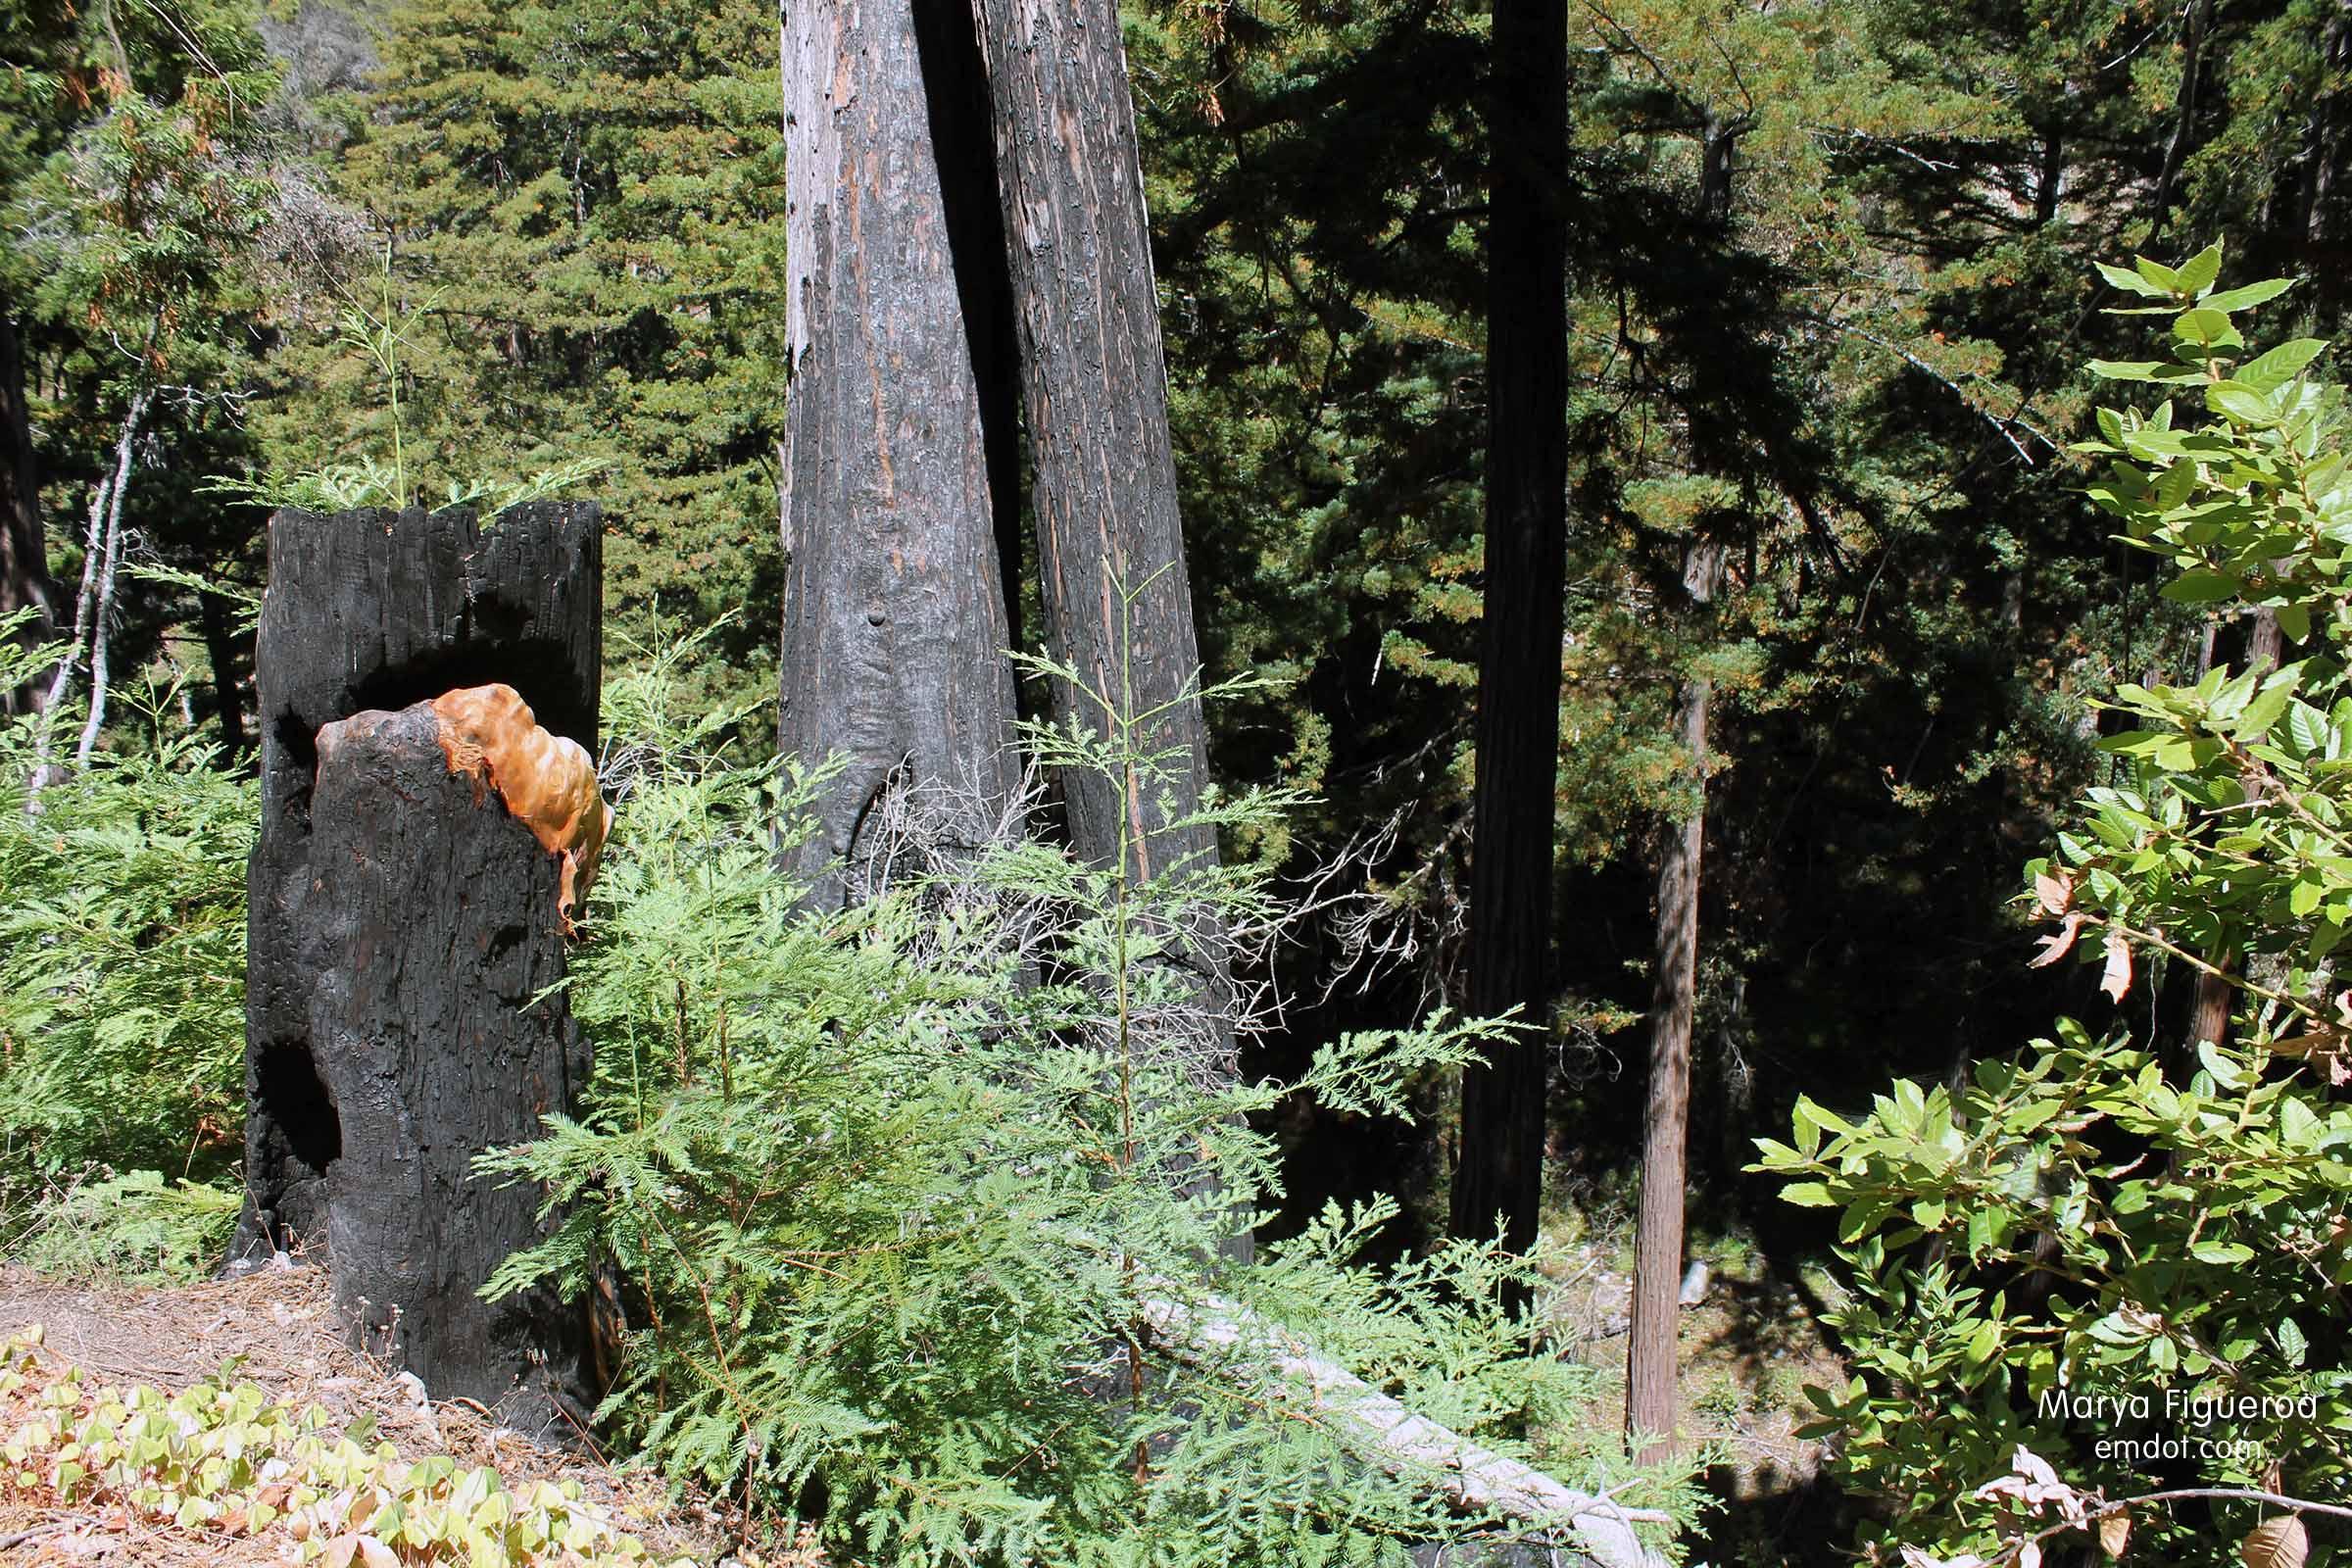 burned trees and left stump